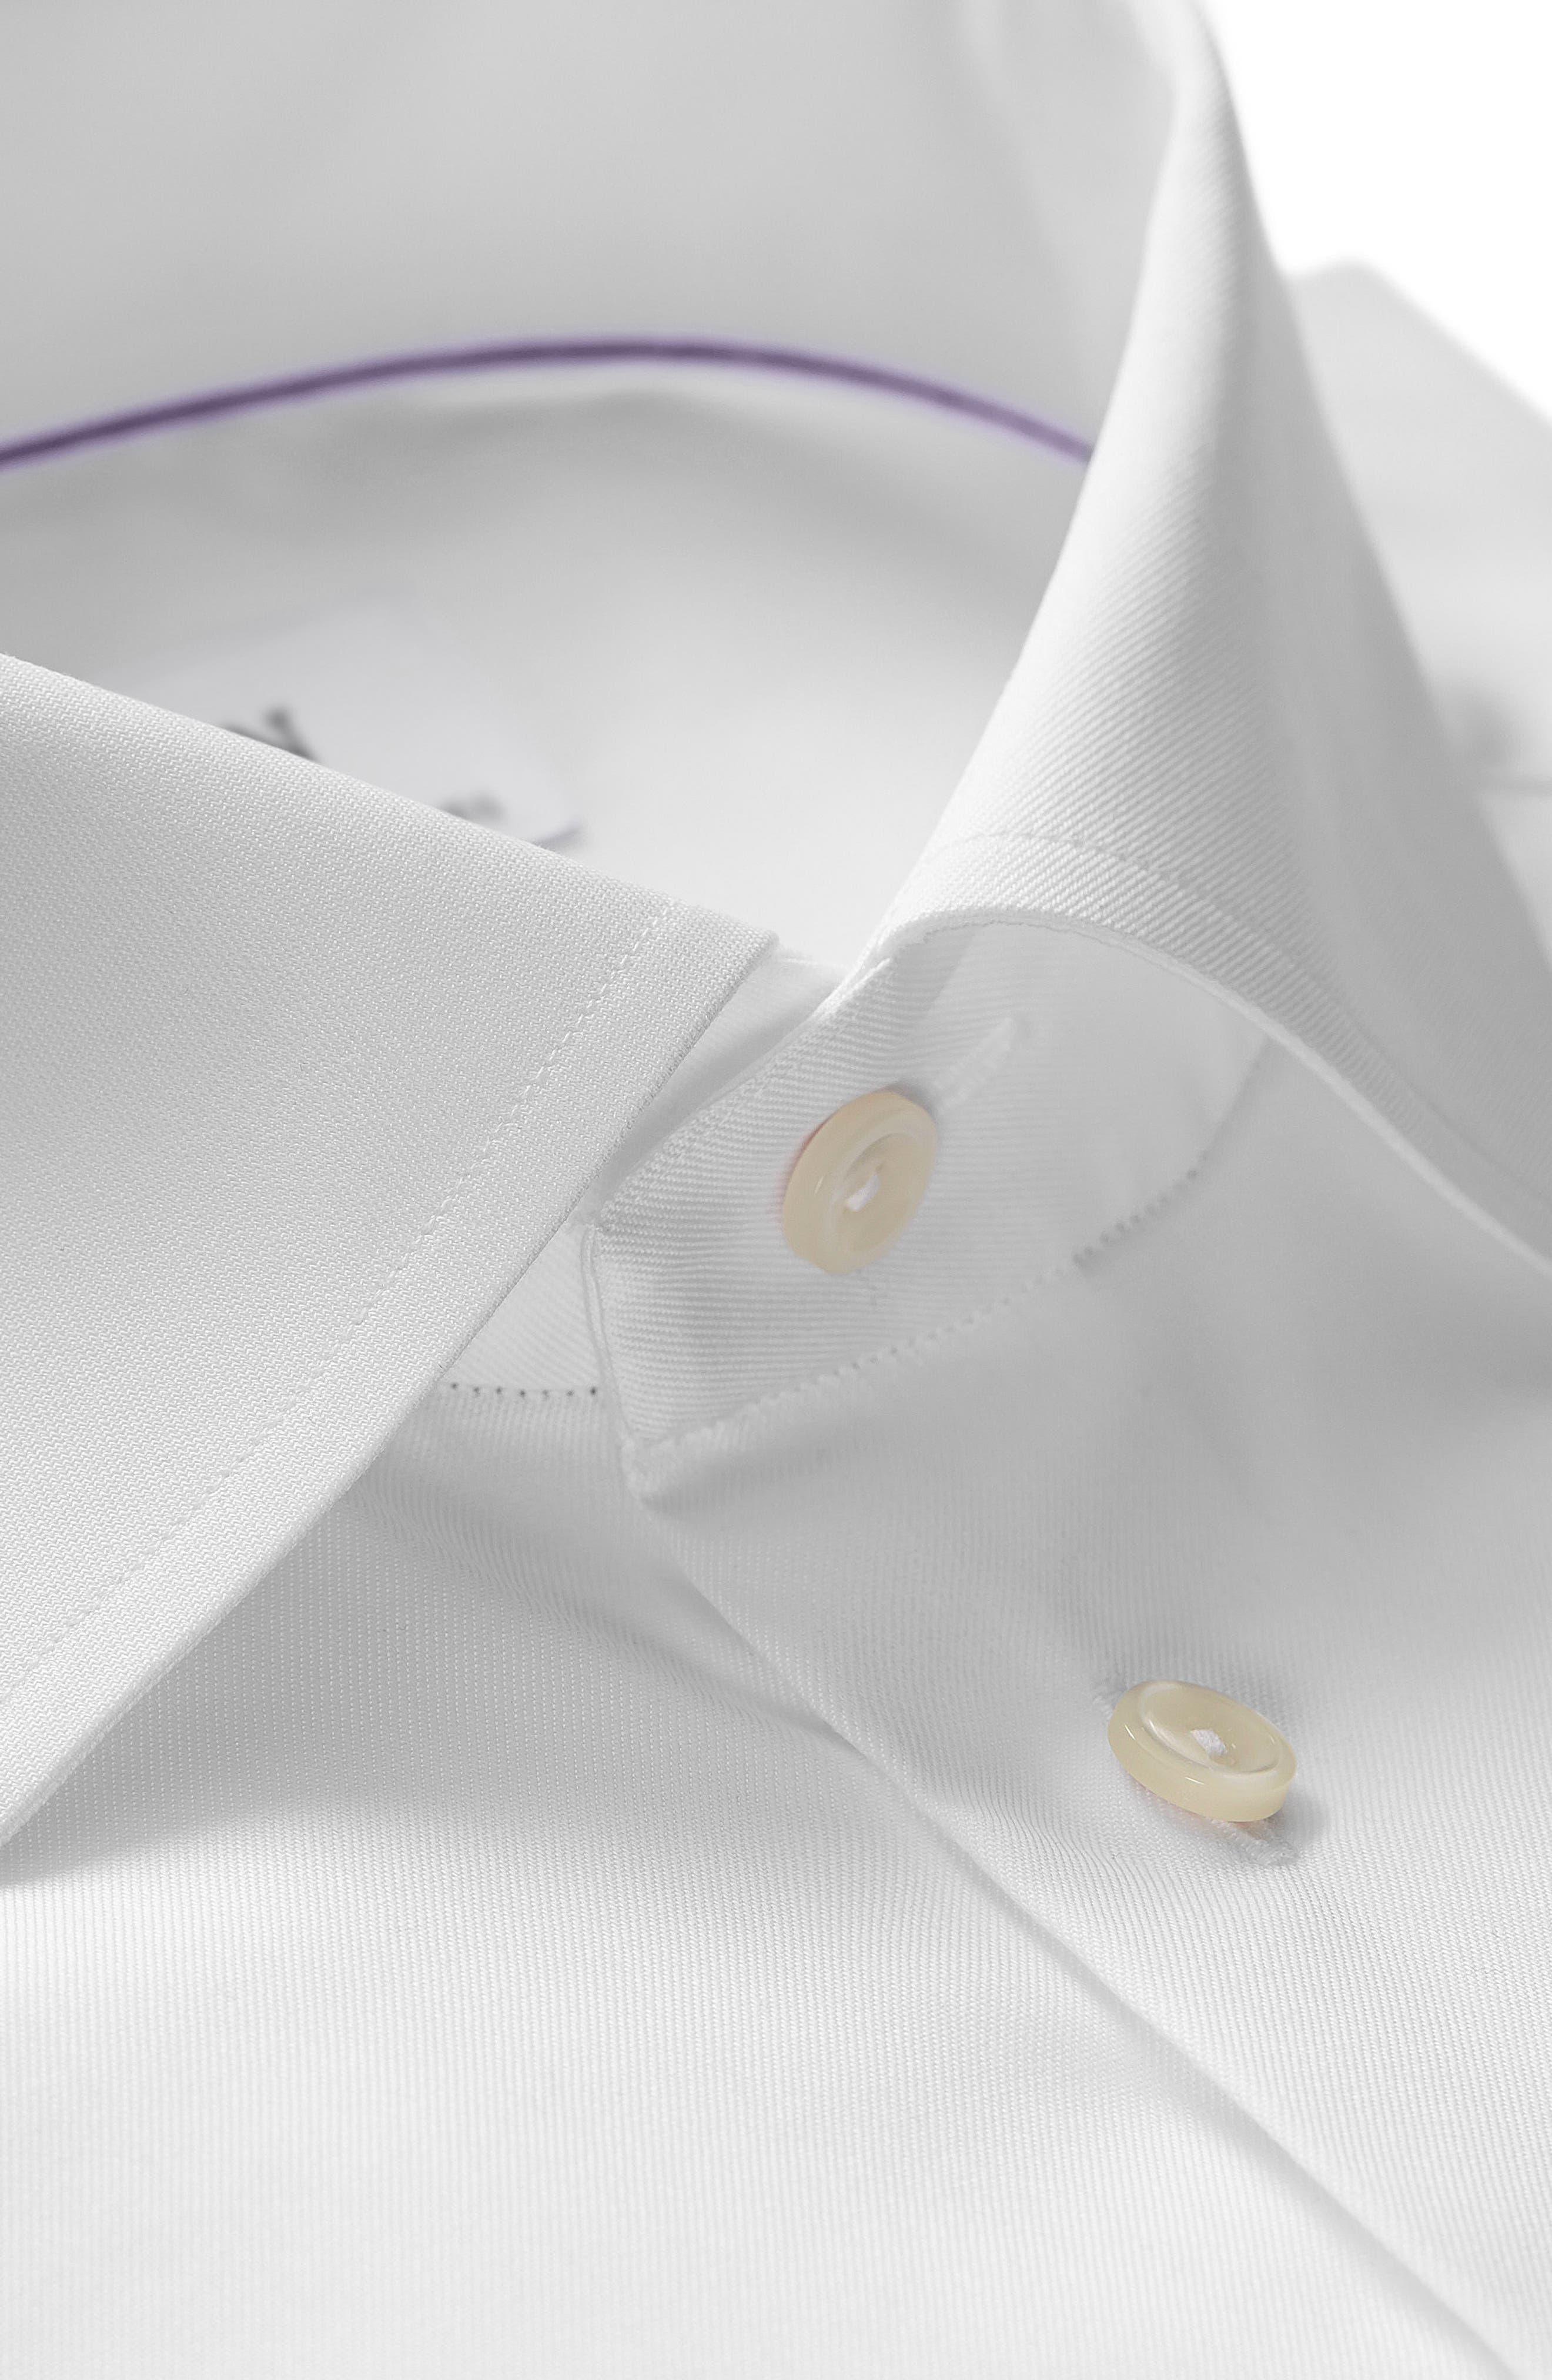 ETON, Slim Fit Twill Dress Shirt, Alternate thumbnail 5, color, WHITE